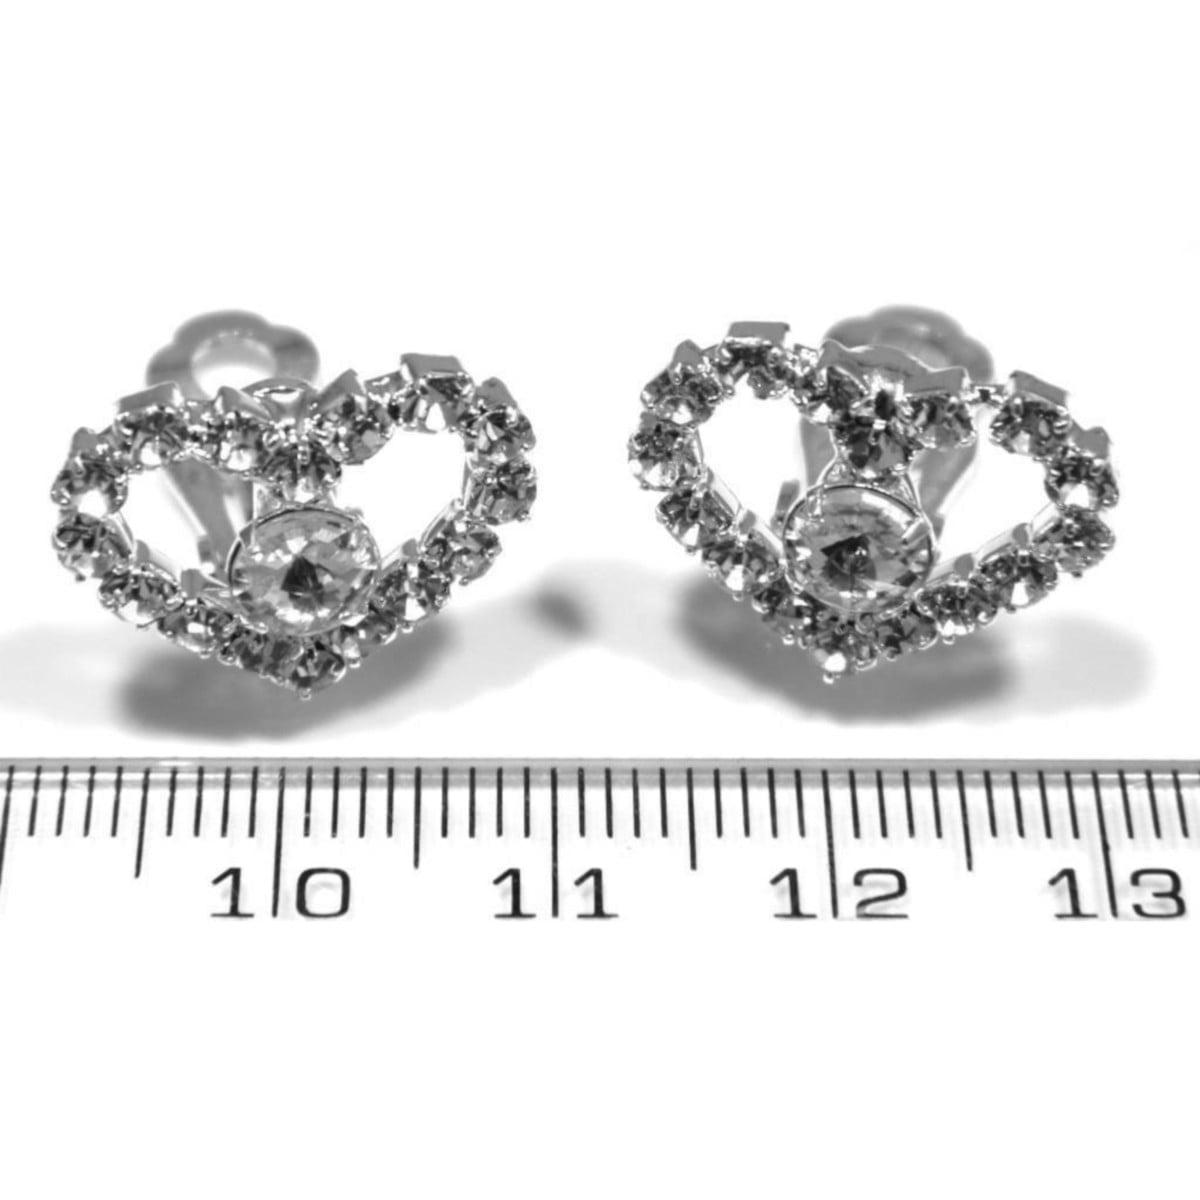 Crystal heart clip on earrings in silver plate ruler